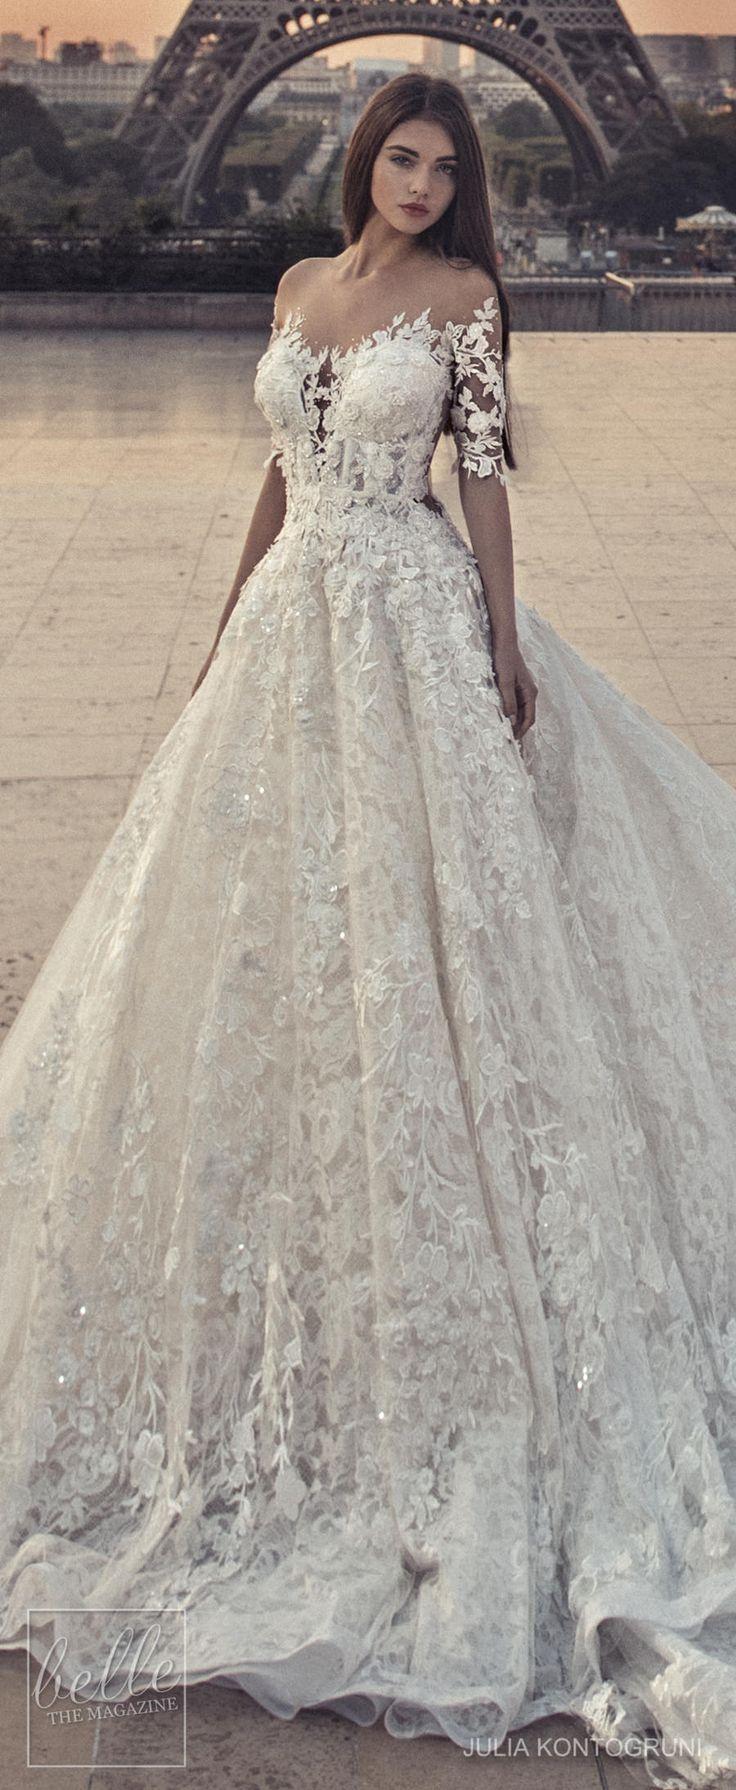 Julia Kontogruni Wedding Dress Collection 2018